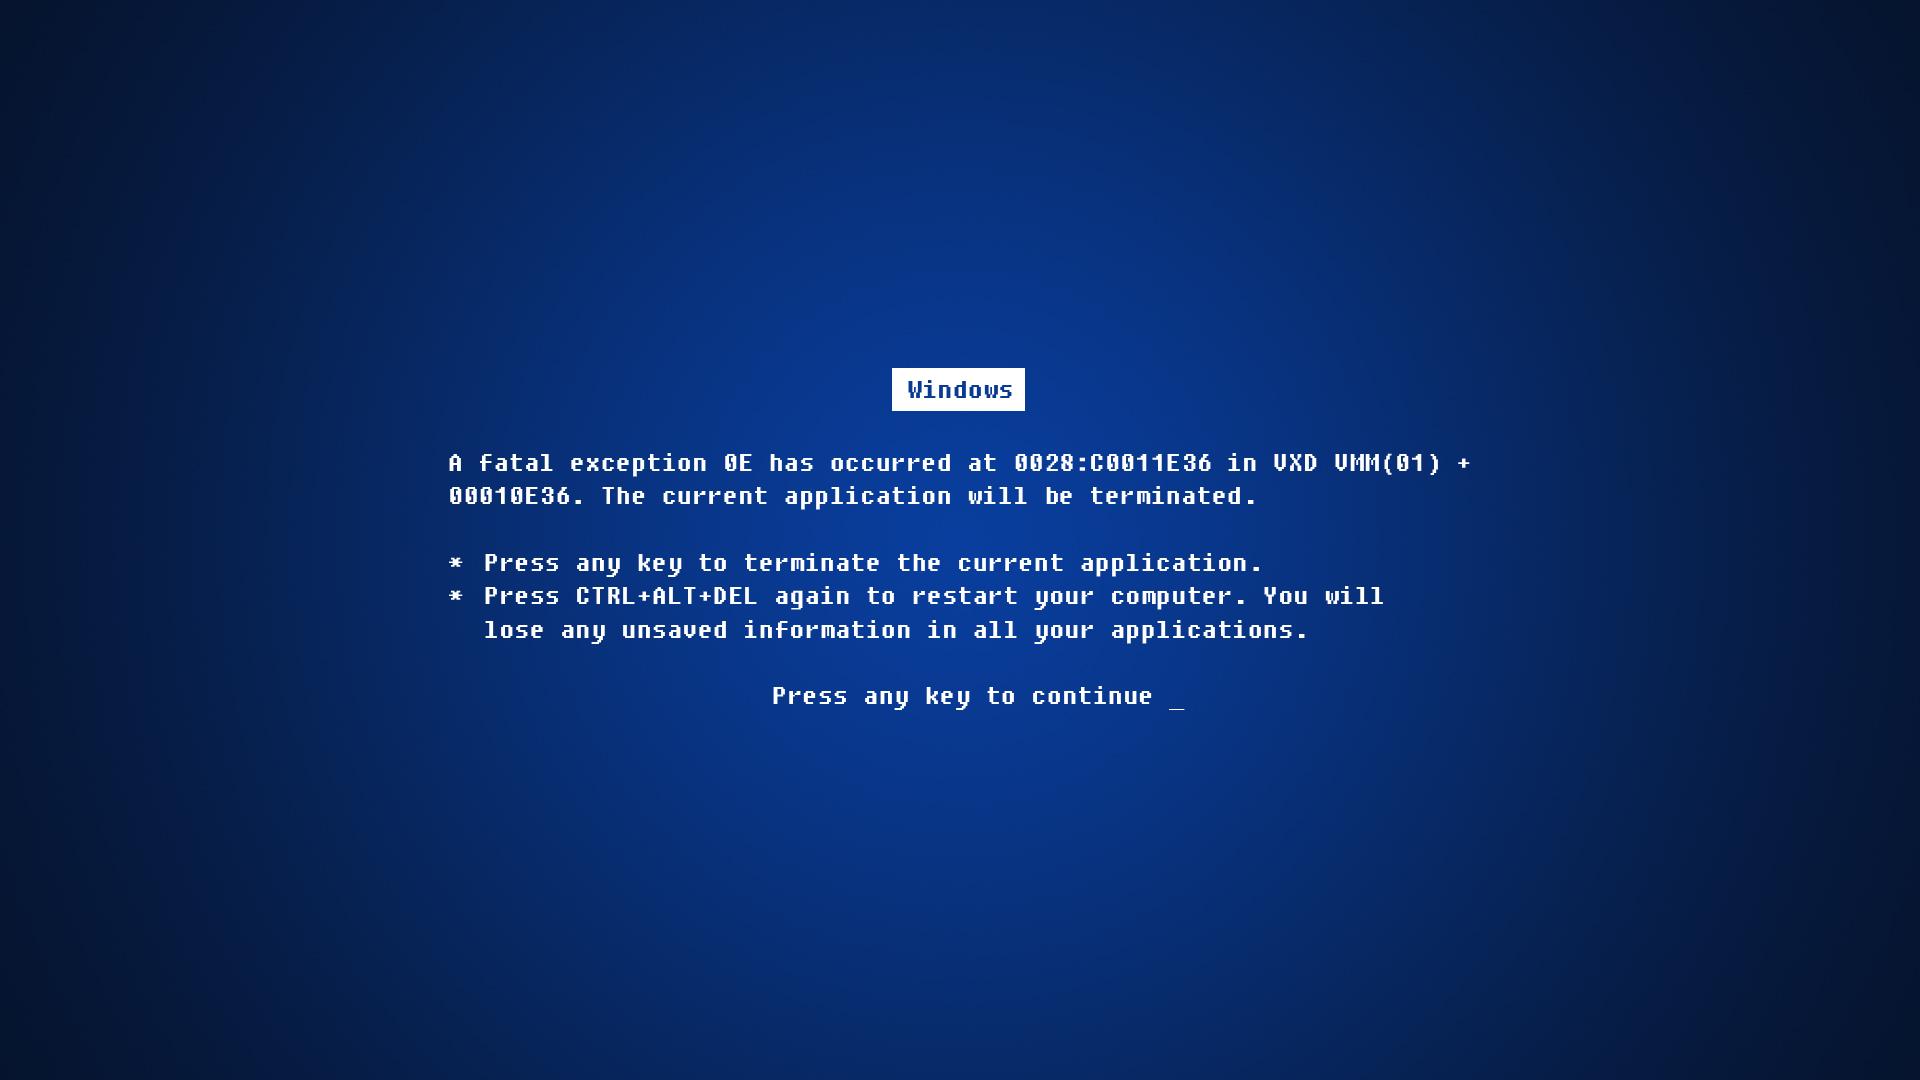 1920x1080 Blue screen of death desktop PC and Mac wallpaper 1920x1080